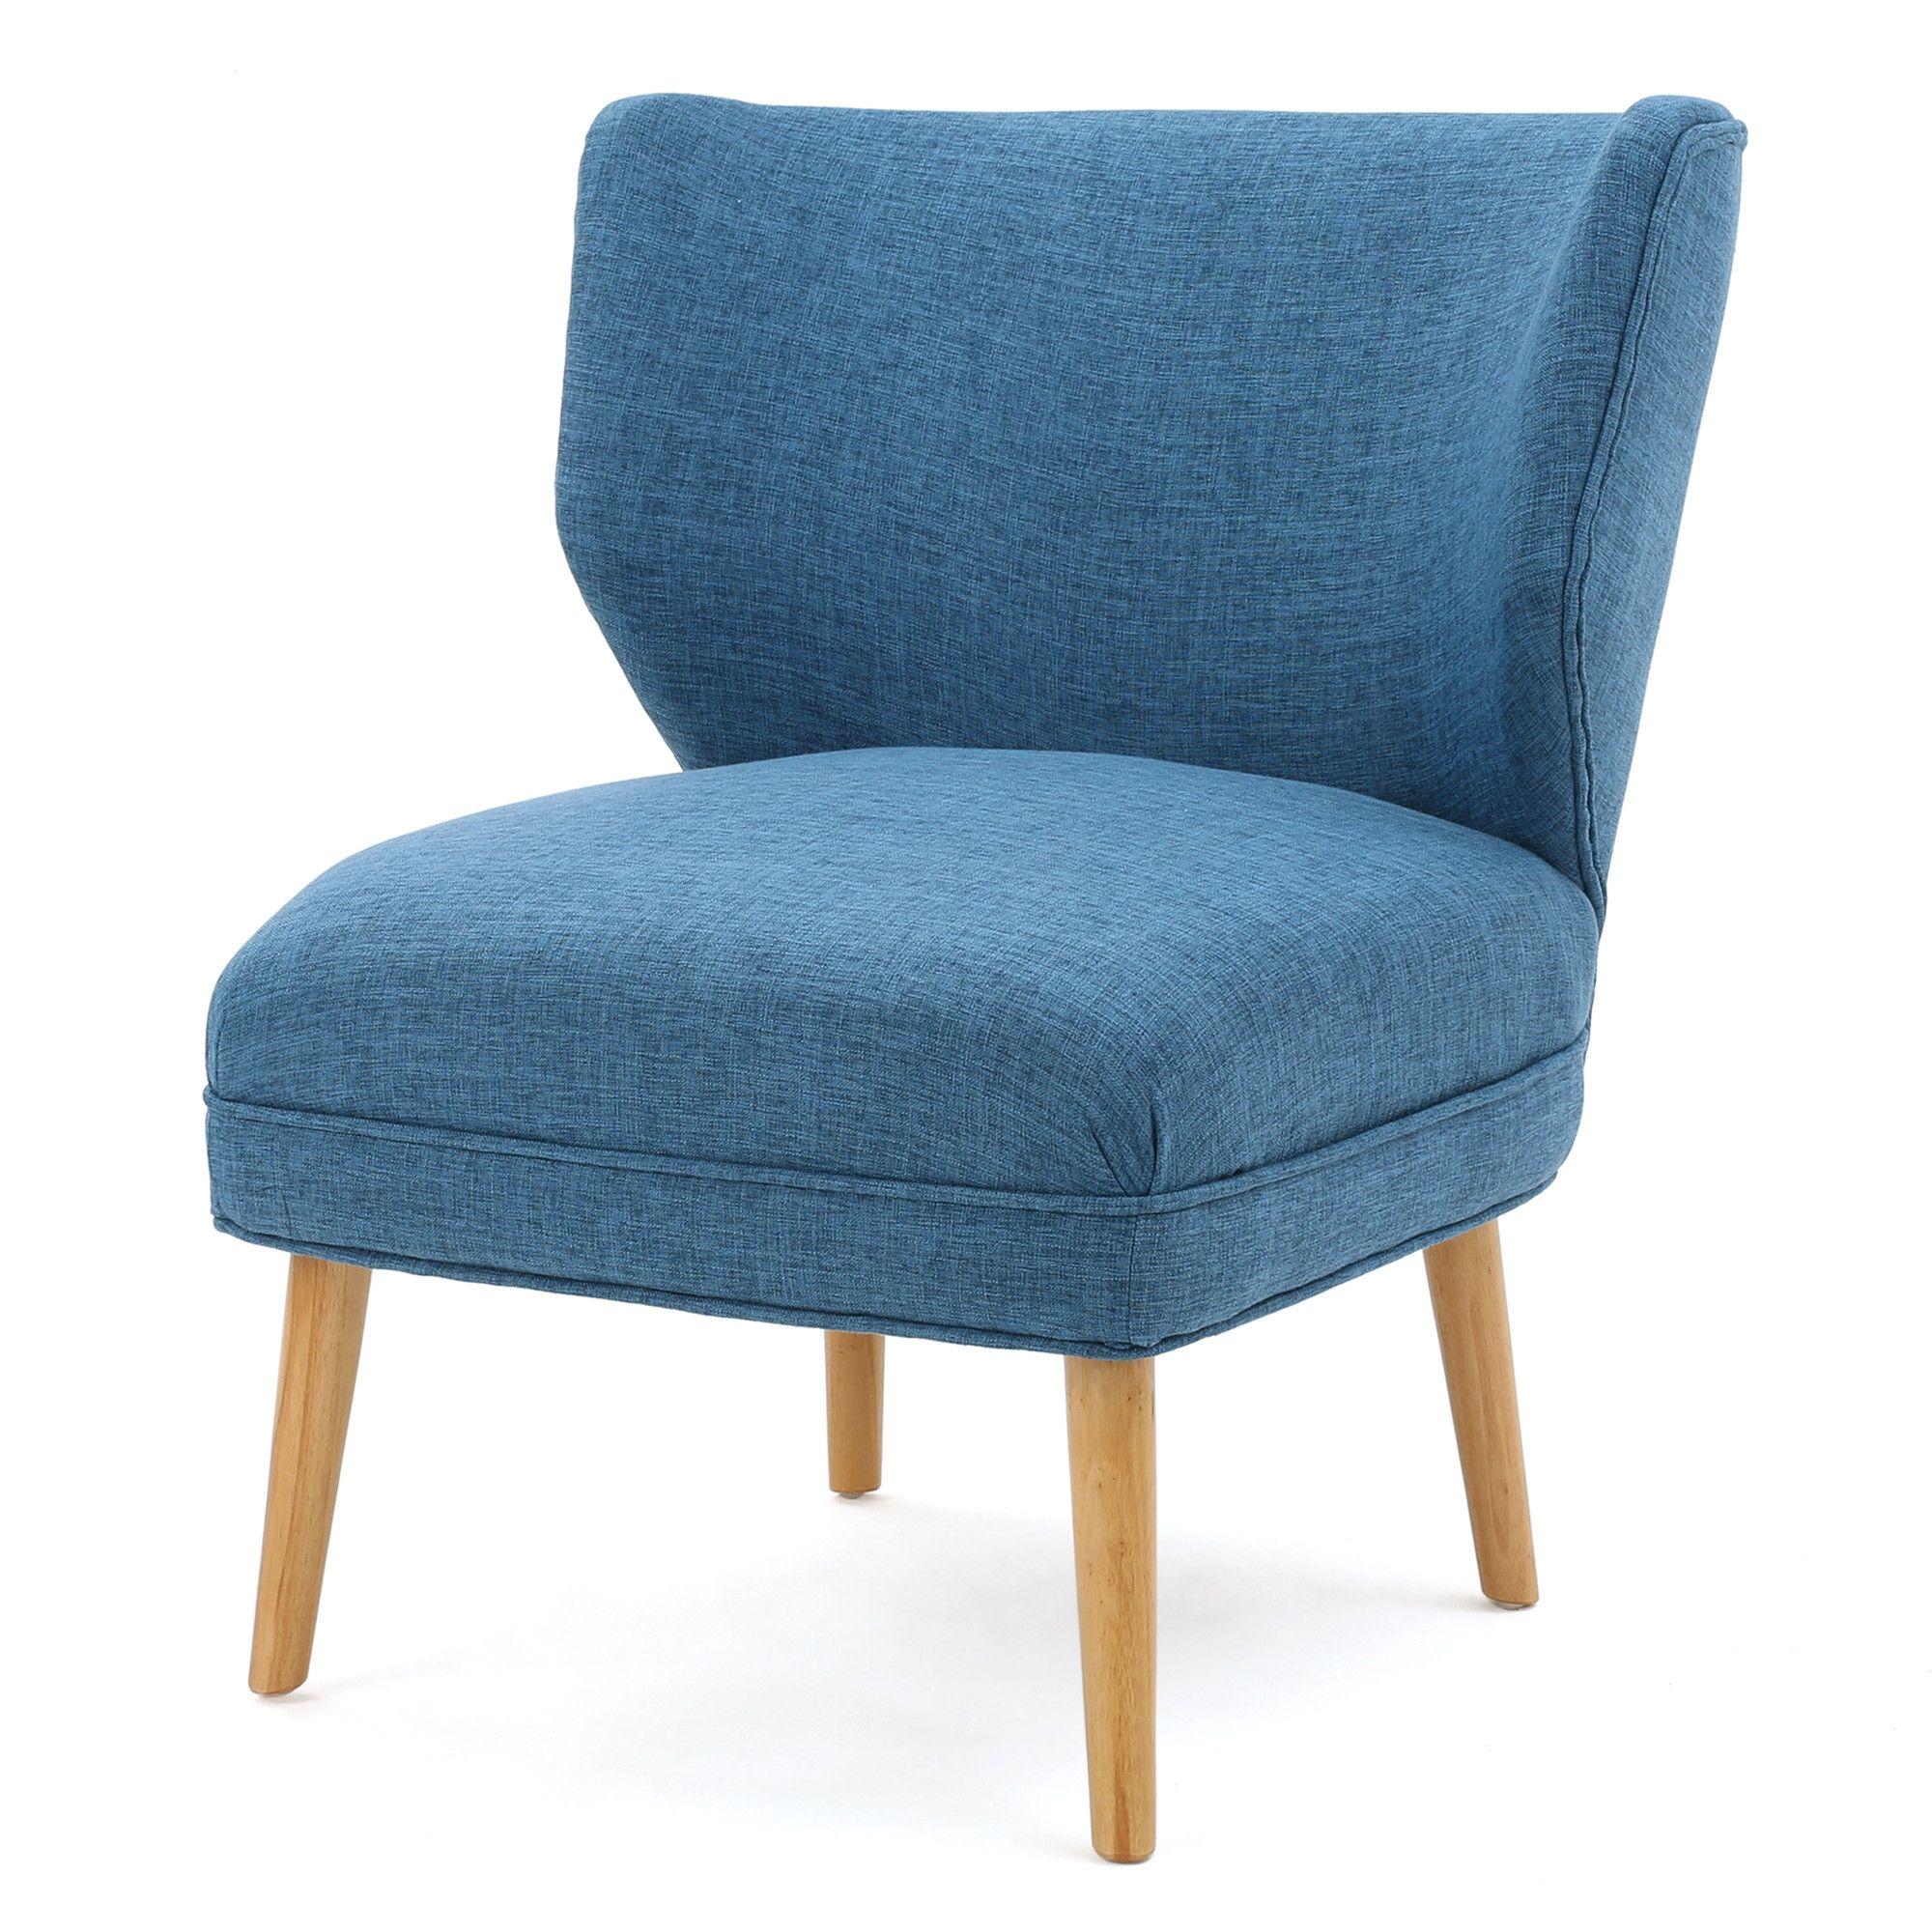 Raleigh Slipper Chair | Slipper chairs, Modern living room furniture ...